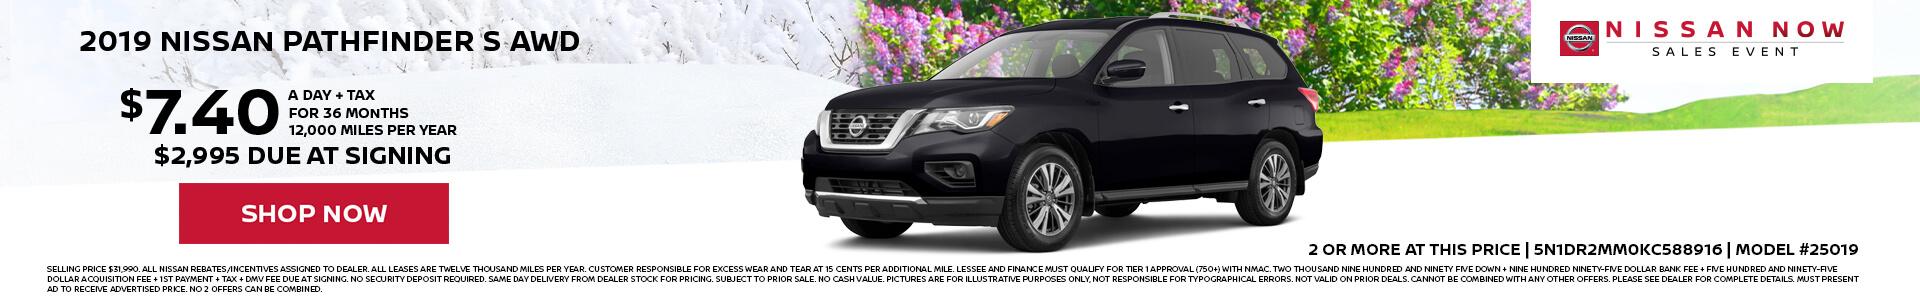 Nissan Pathfinder $7.40 Lease